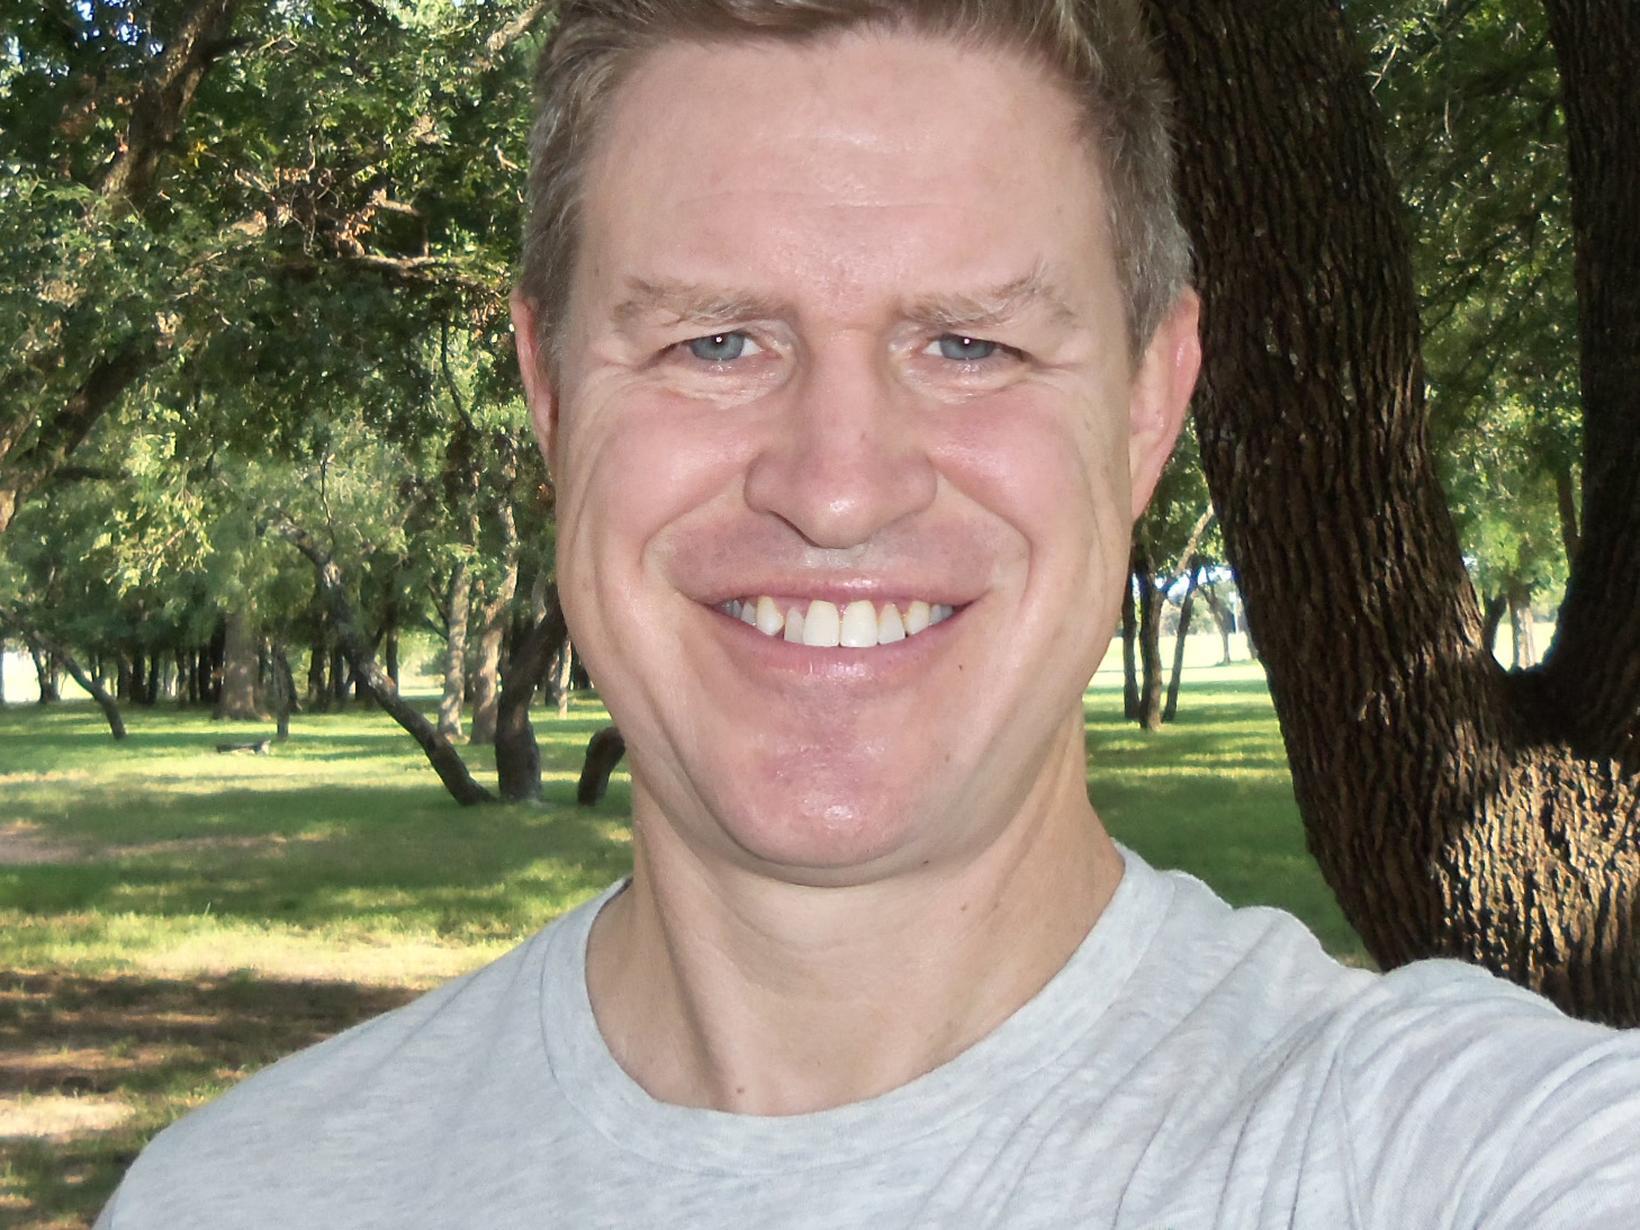 Brian from Orlando, Florida, United States